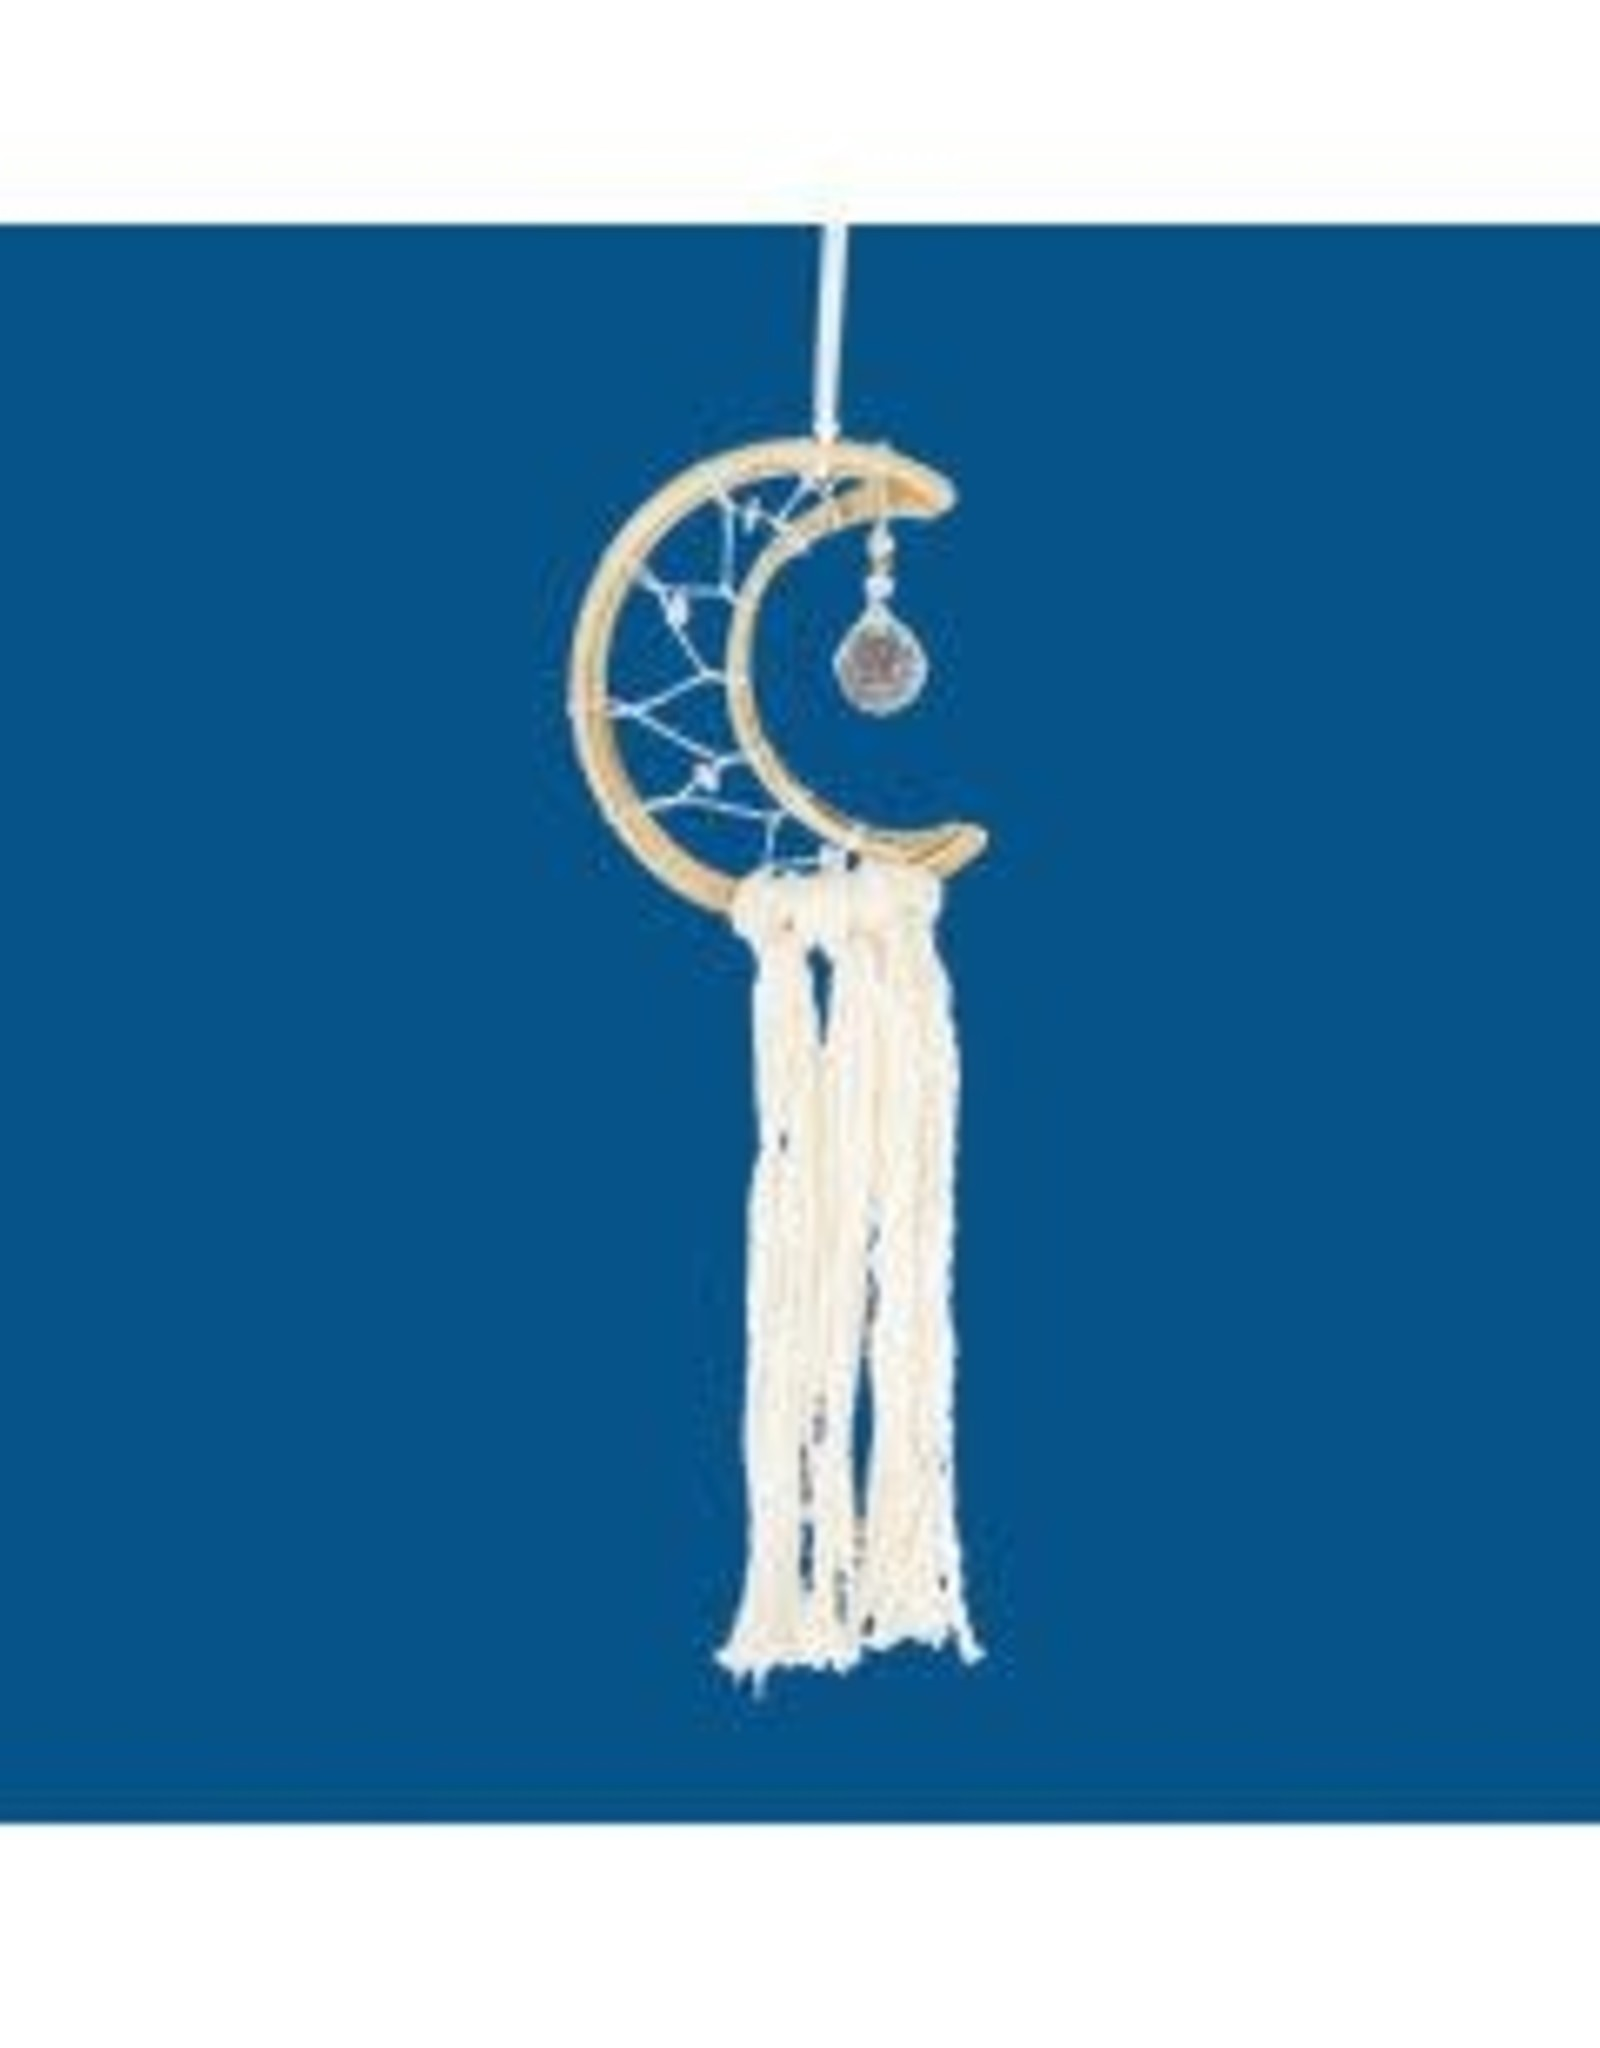 Dream Catcher, Little White Moon, Nepal